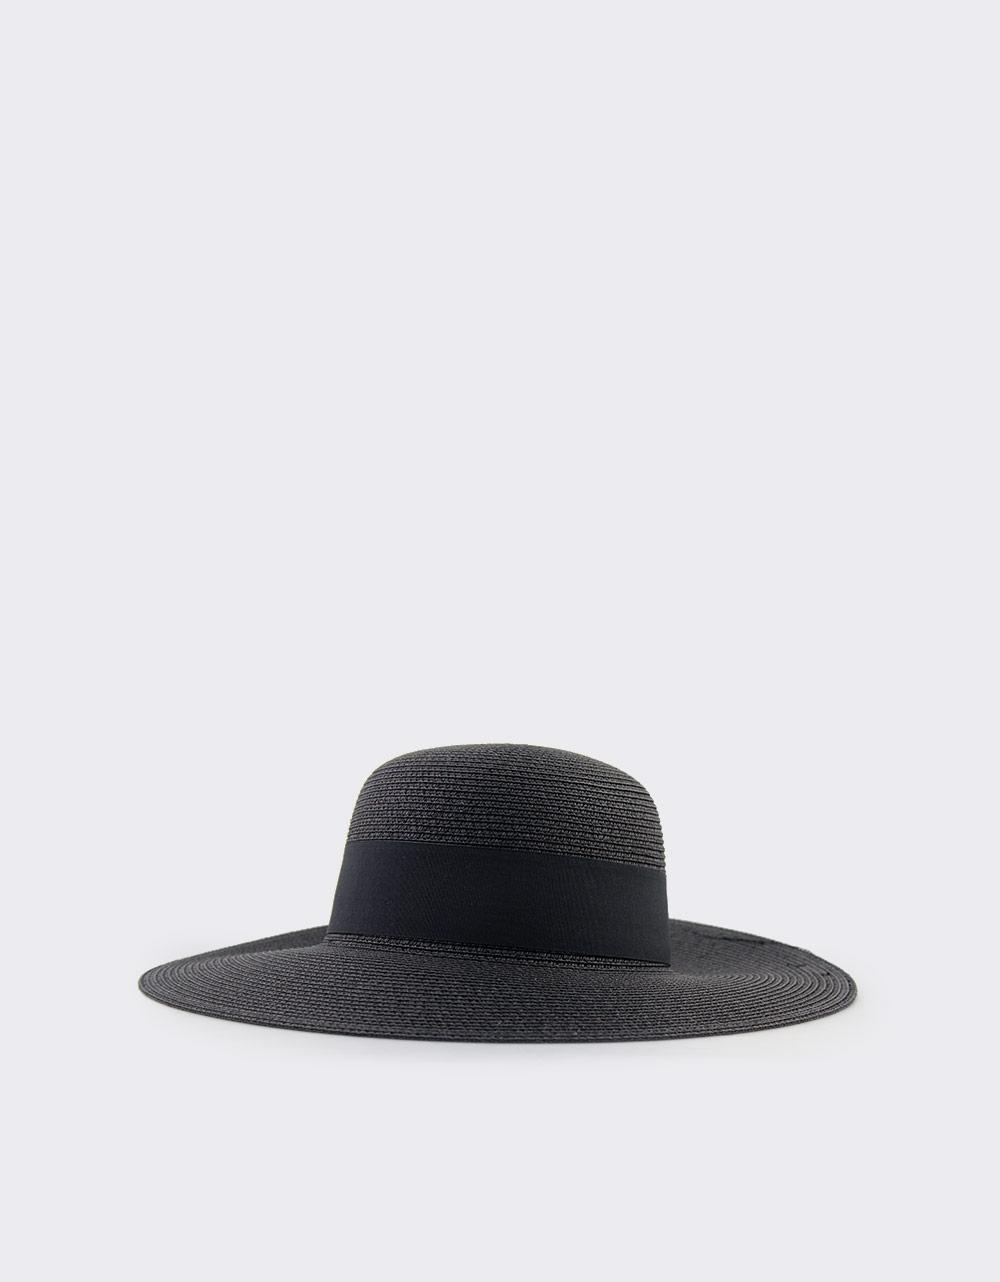 16a2e142b0 Εικόνα από Γυναικεία καπέλα ψάθινα Μαύρο